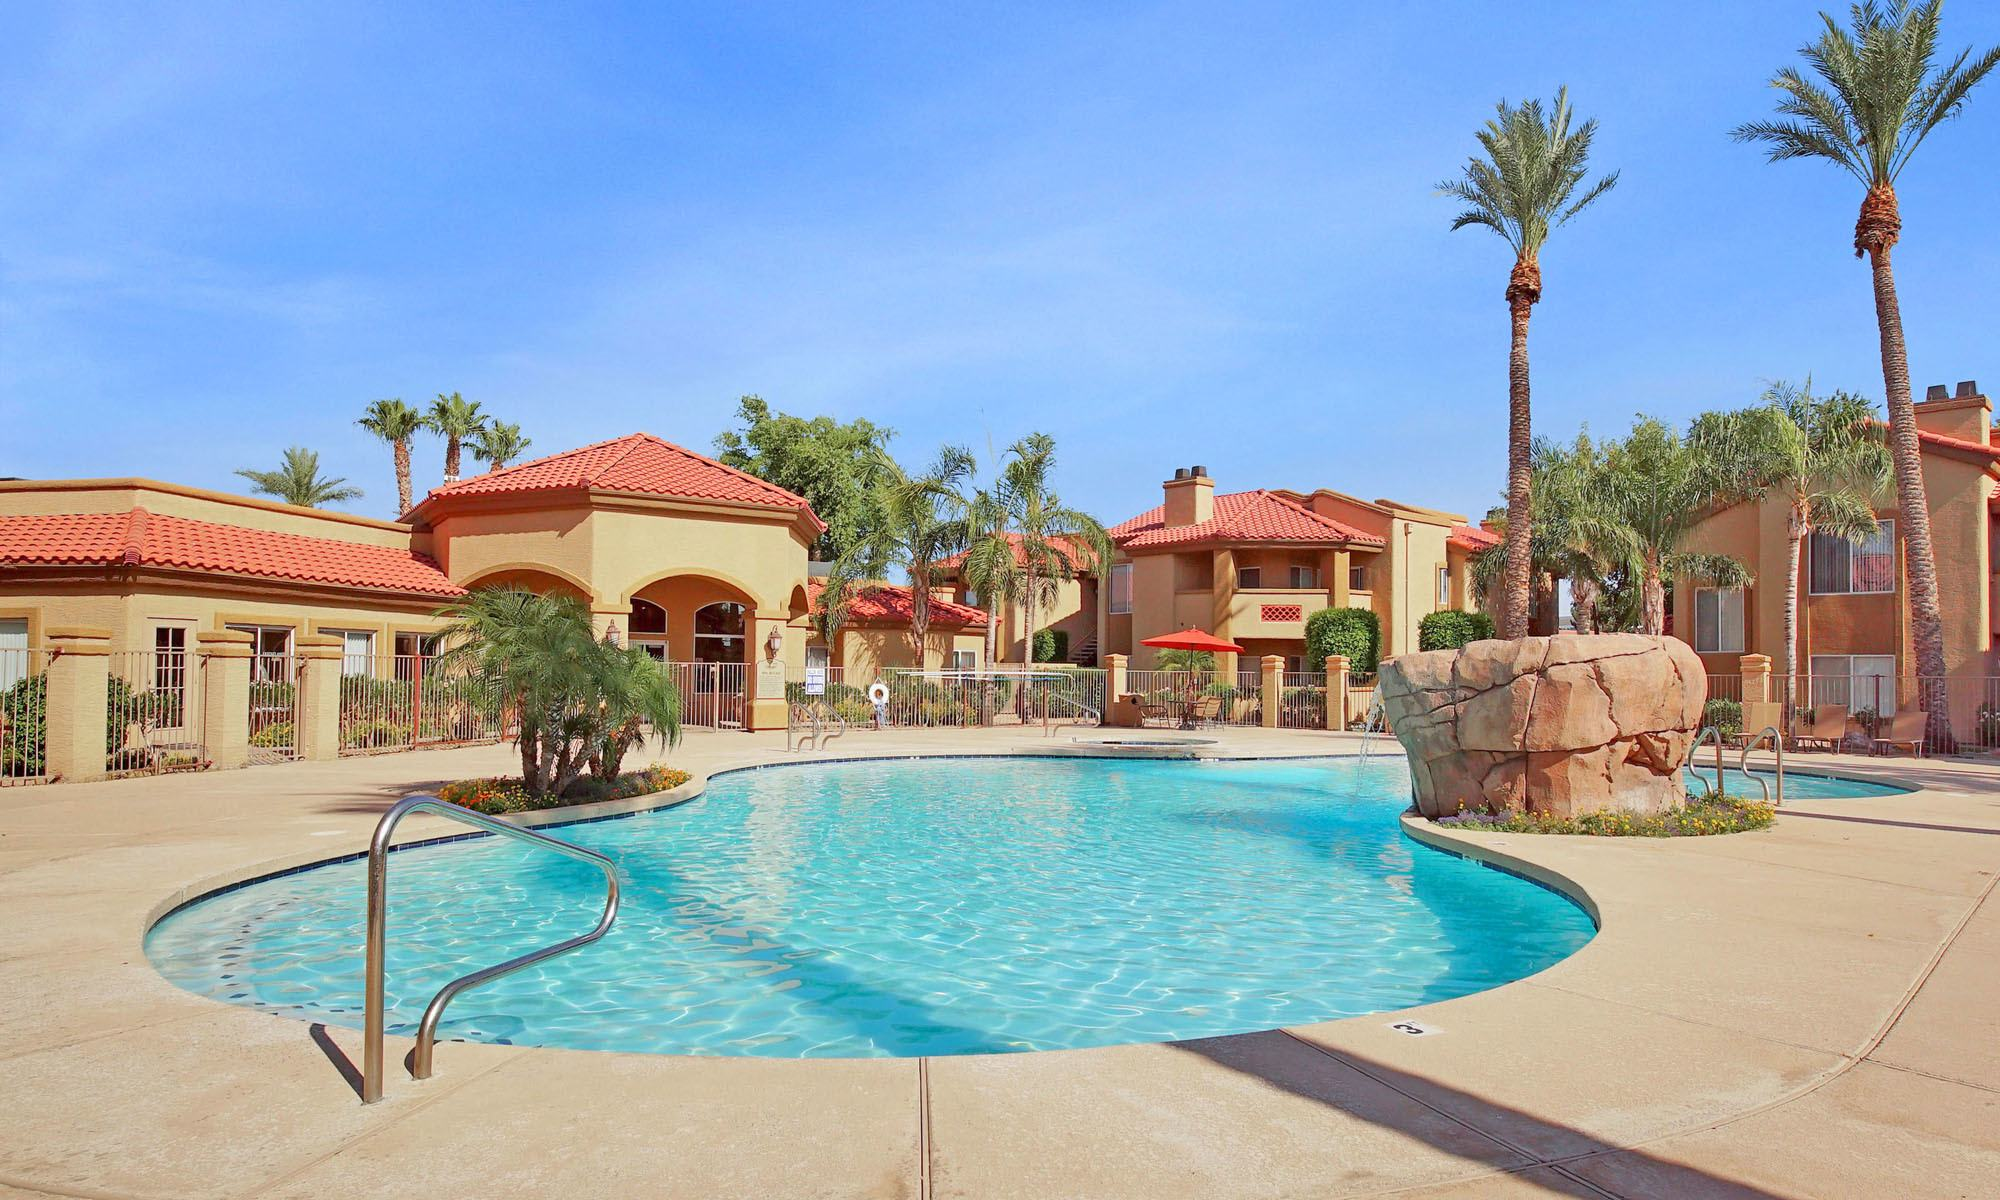 Bedroom Apartments In Glendale Az